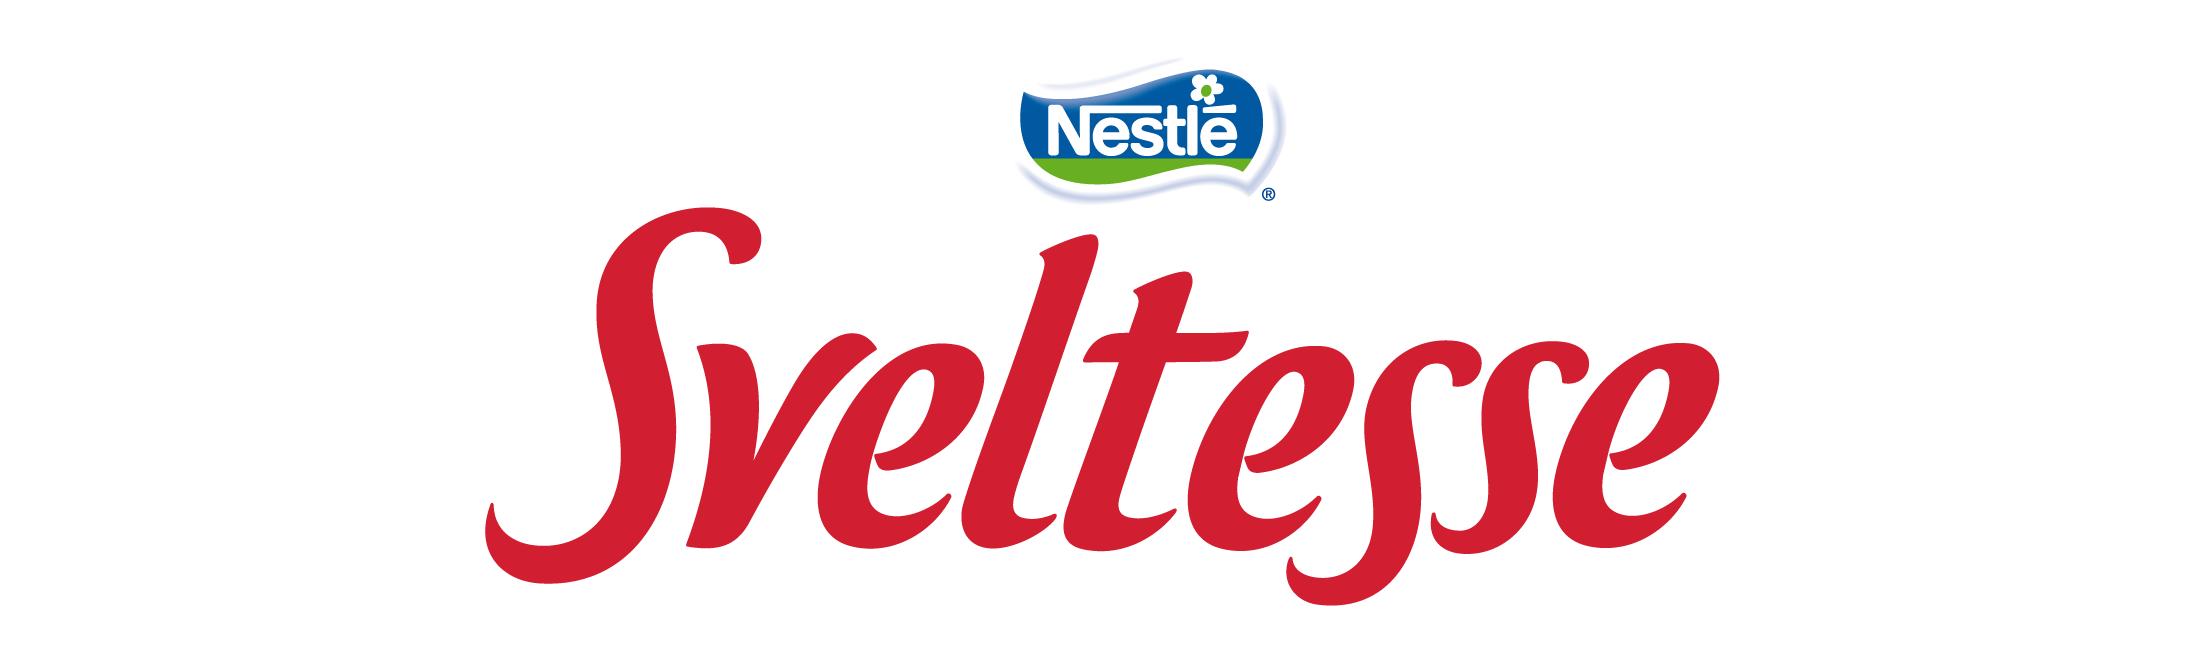 Bien connu Nestlé / Sveltesse | Typofacto PZ26